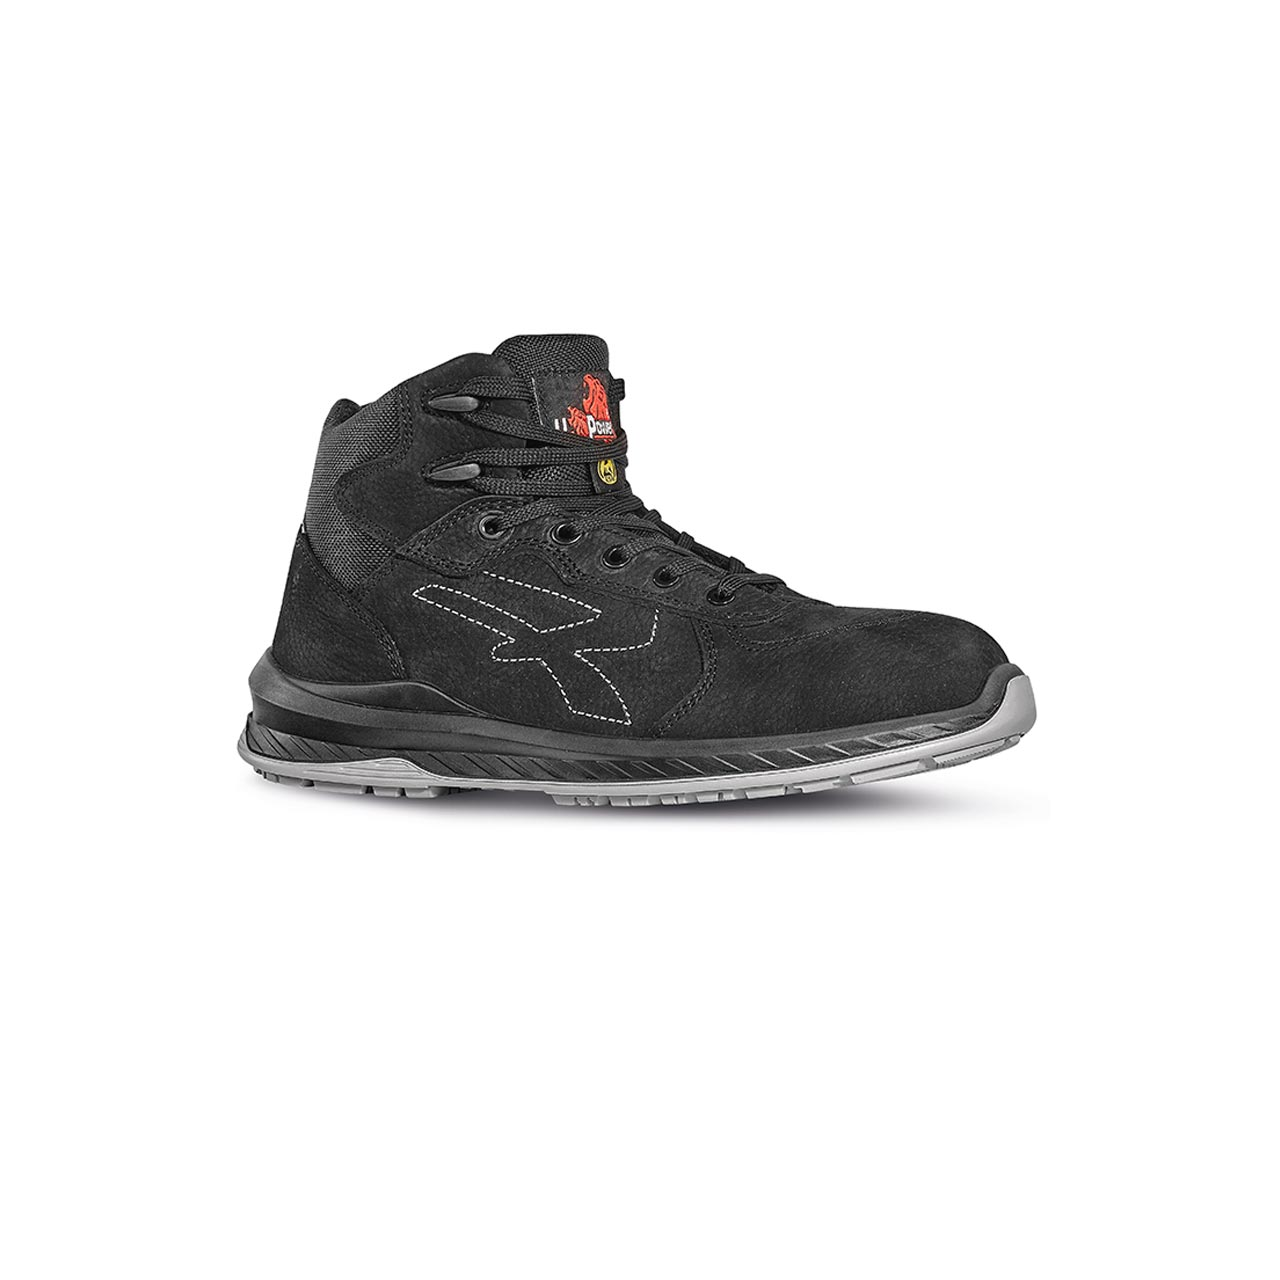 scarpa antinfortunistica alta upower modello tweed linea redindustry vista laterale